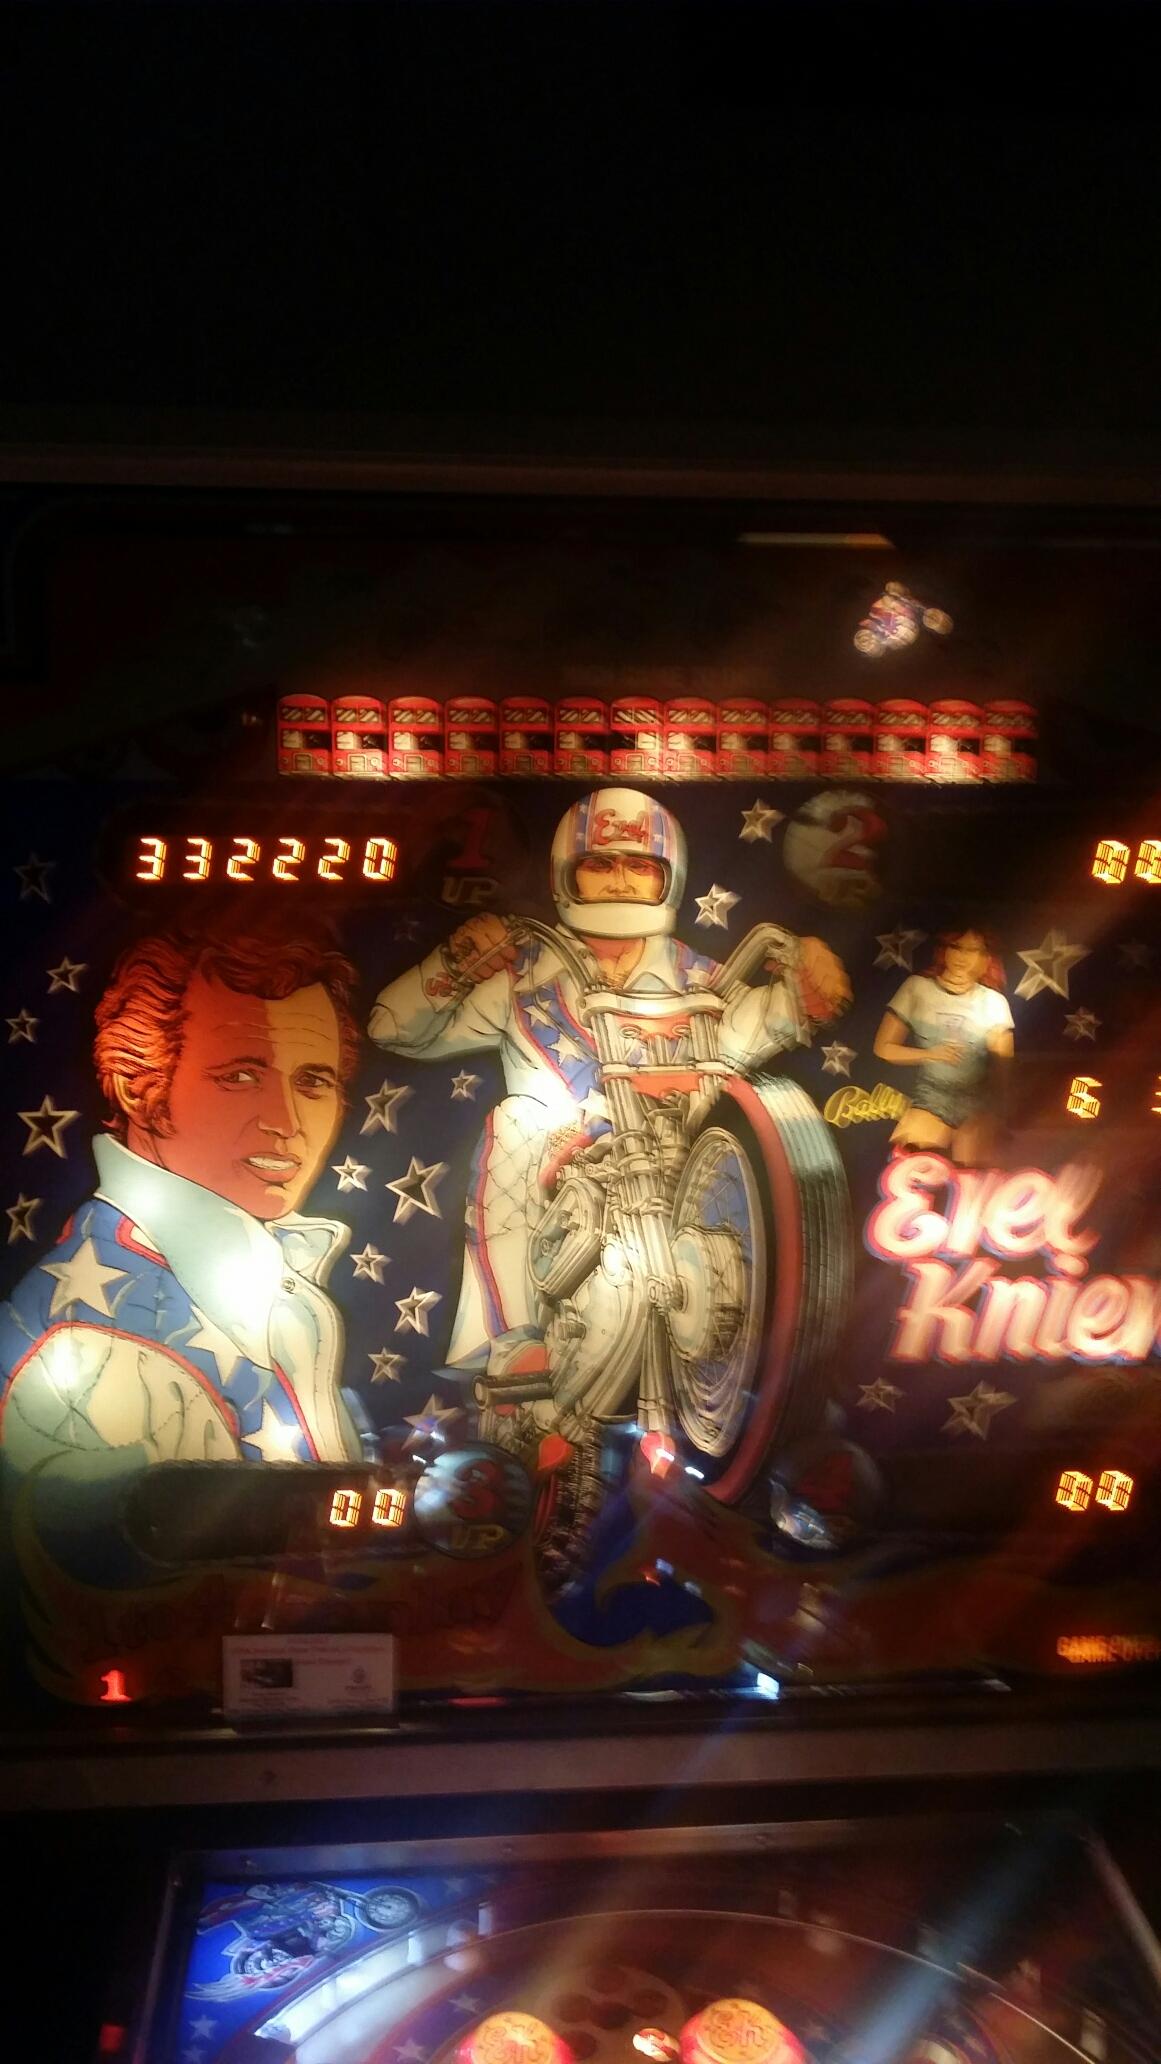 Evel Knievel 332,220 points